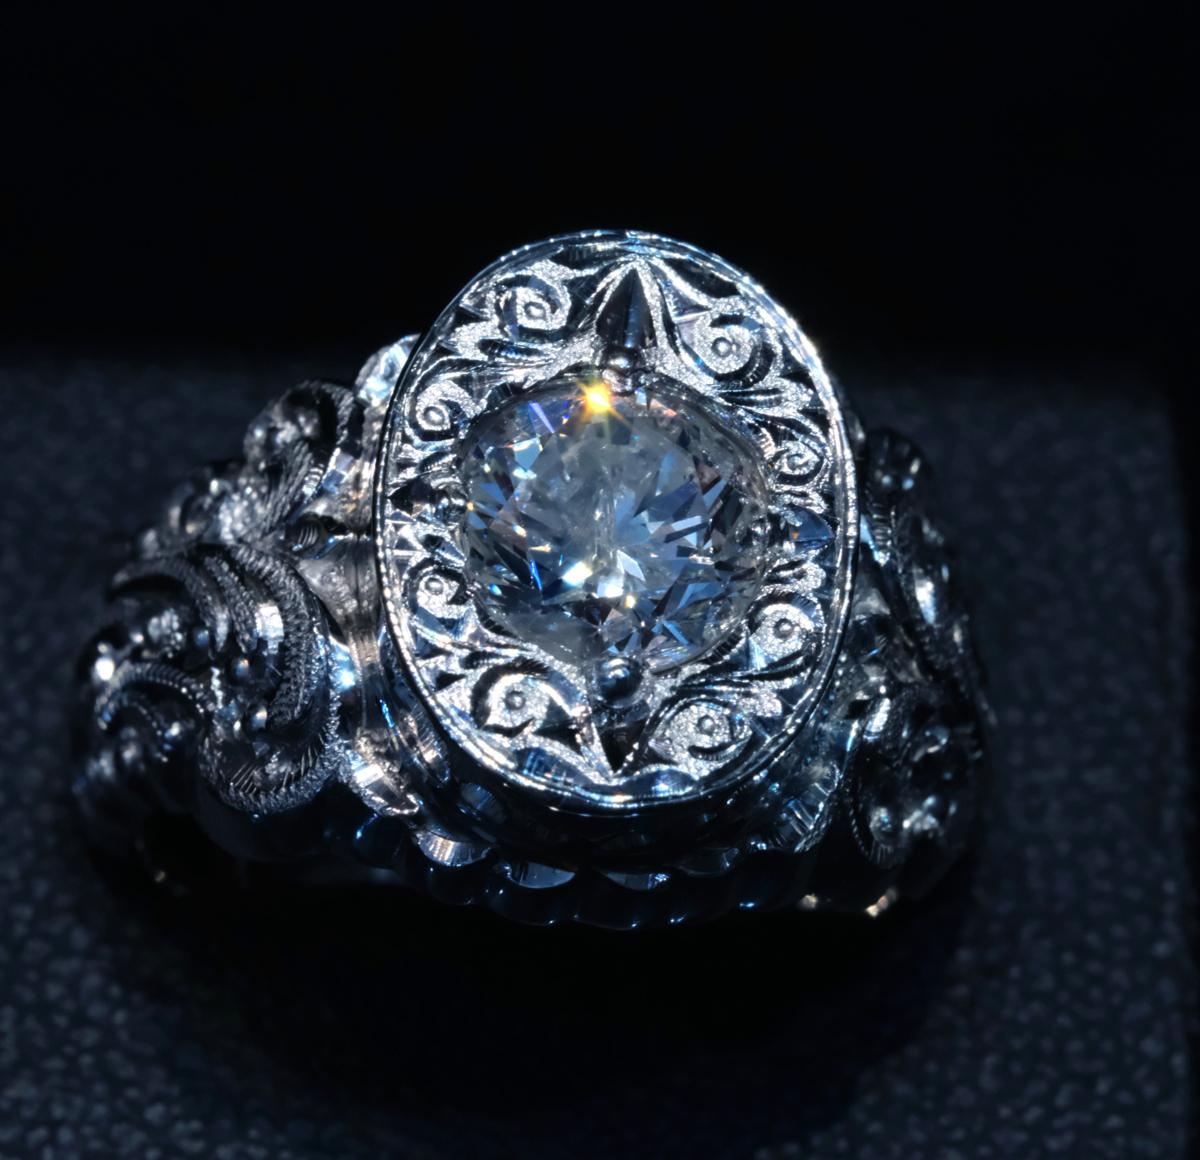 F2328【手創彫金】美しい天然大粒ダイヤモンド1.50ct 最高級Pt900無垢セレブリティメンズリング サイズ19 重量26.49g 縦幅16.6mm_画像3